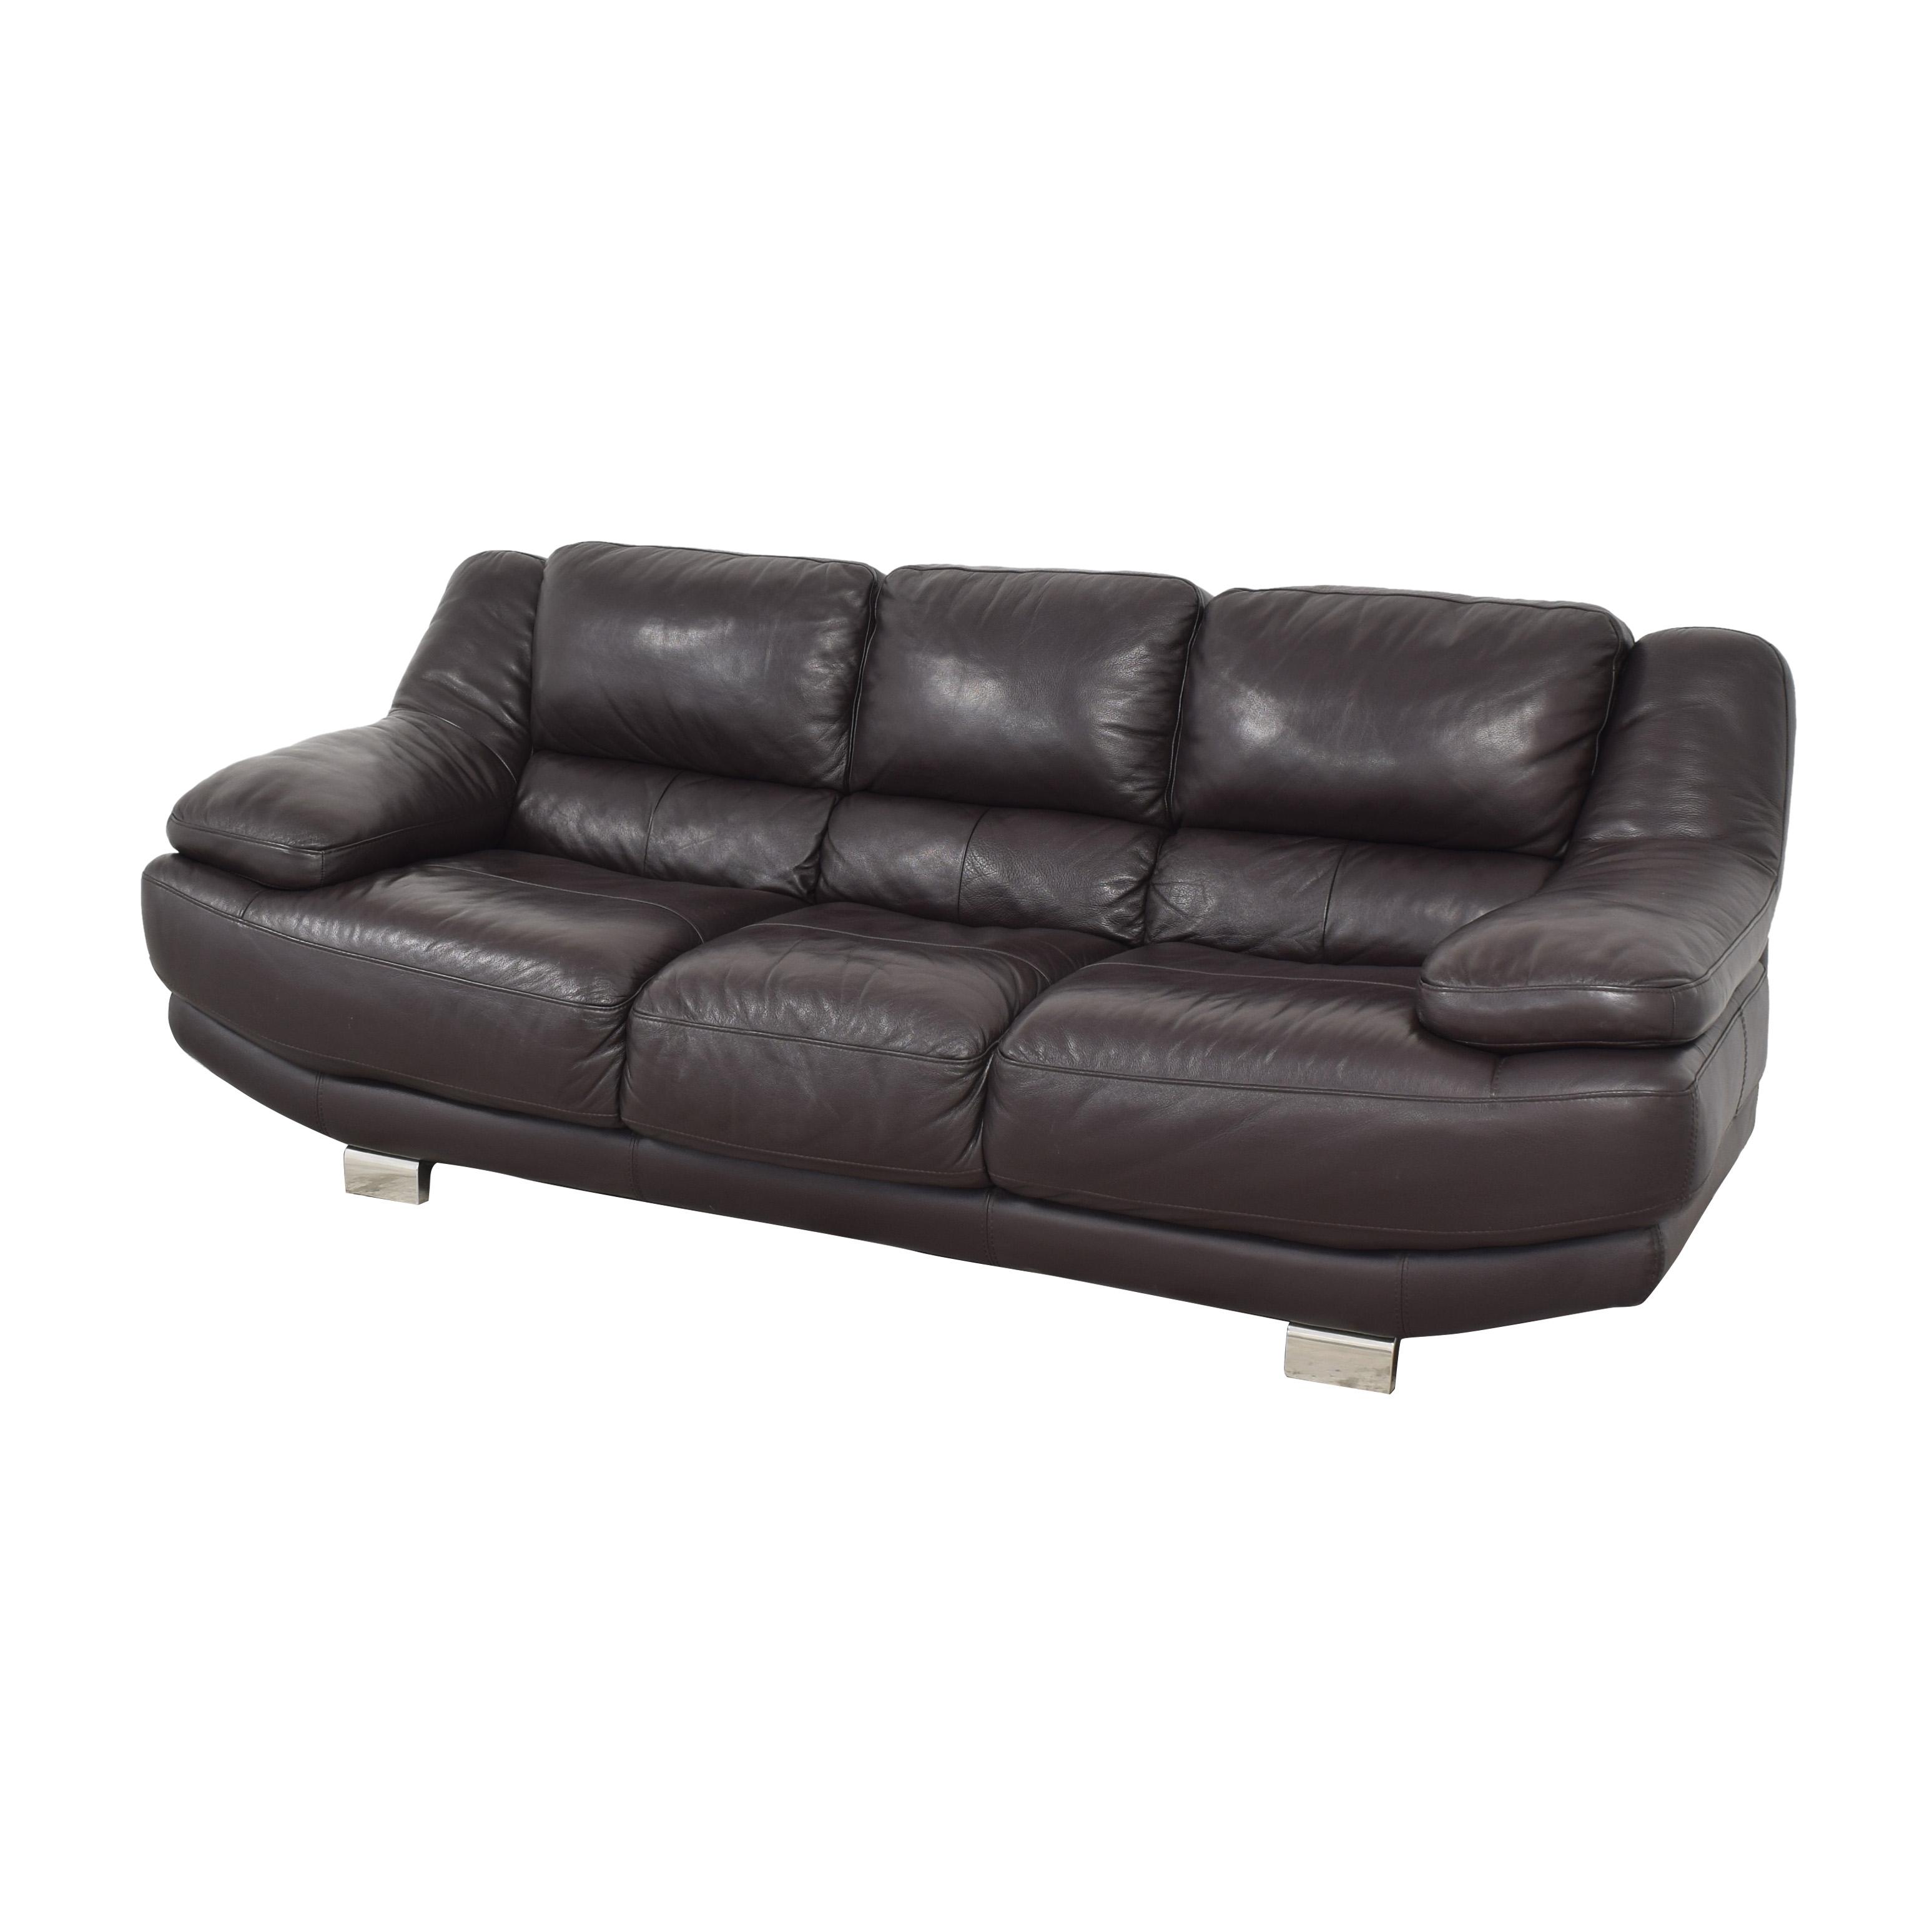 buy Raymour & Flanigan Raymour & Flanigan Three Seat Sofa online